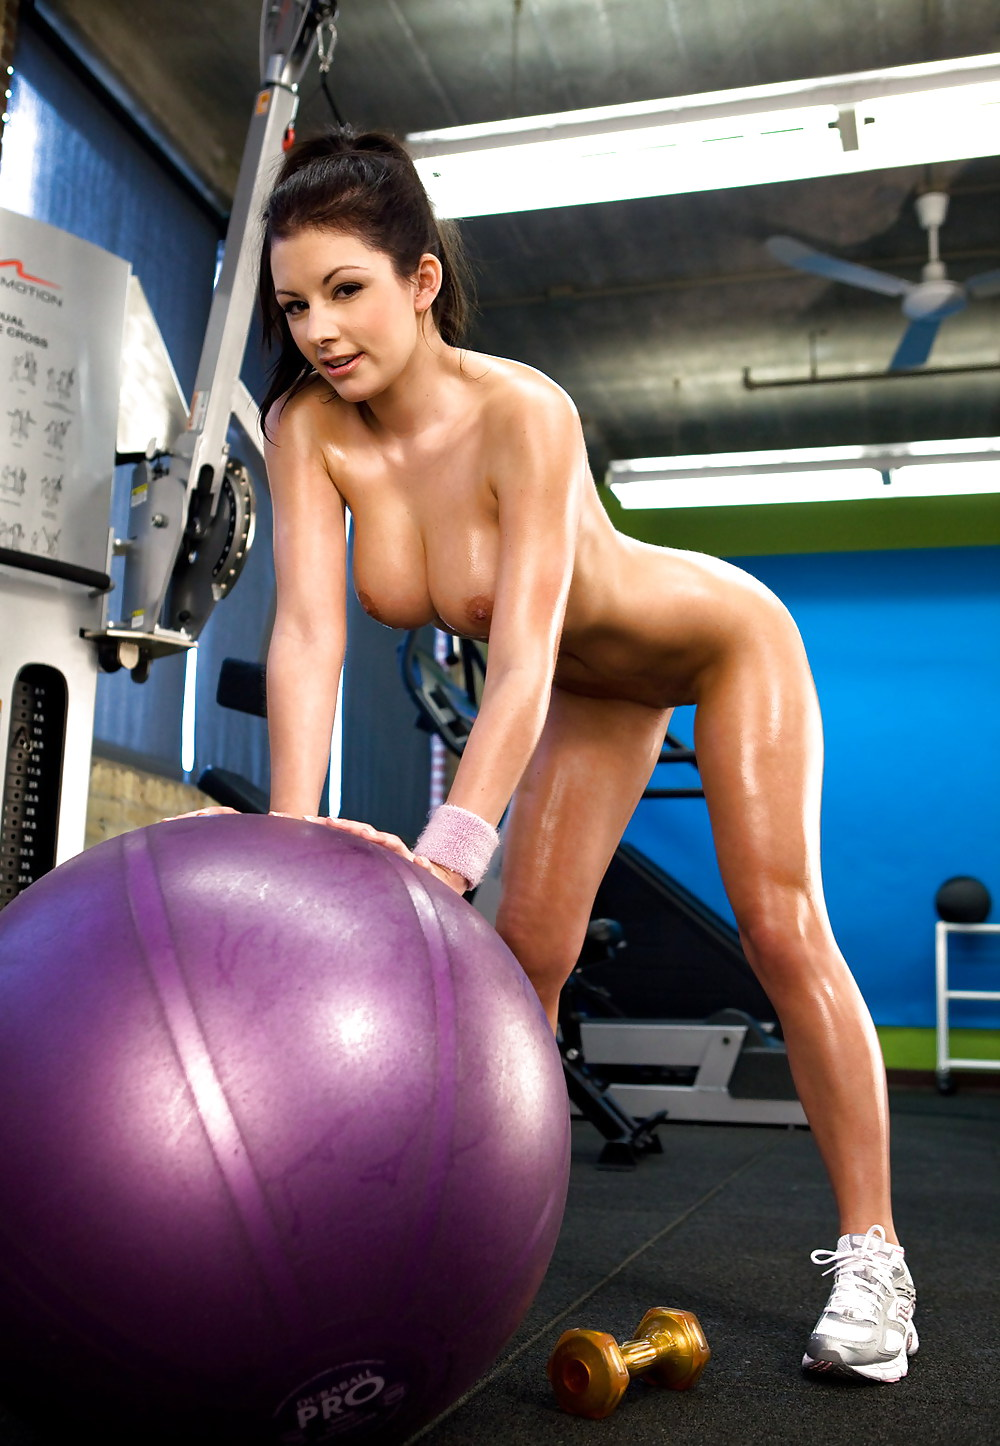 pornstar-workout-pics-photos-naked-girls-at-the-strip-club